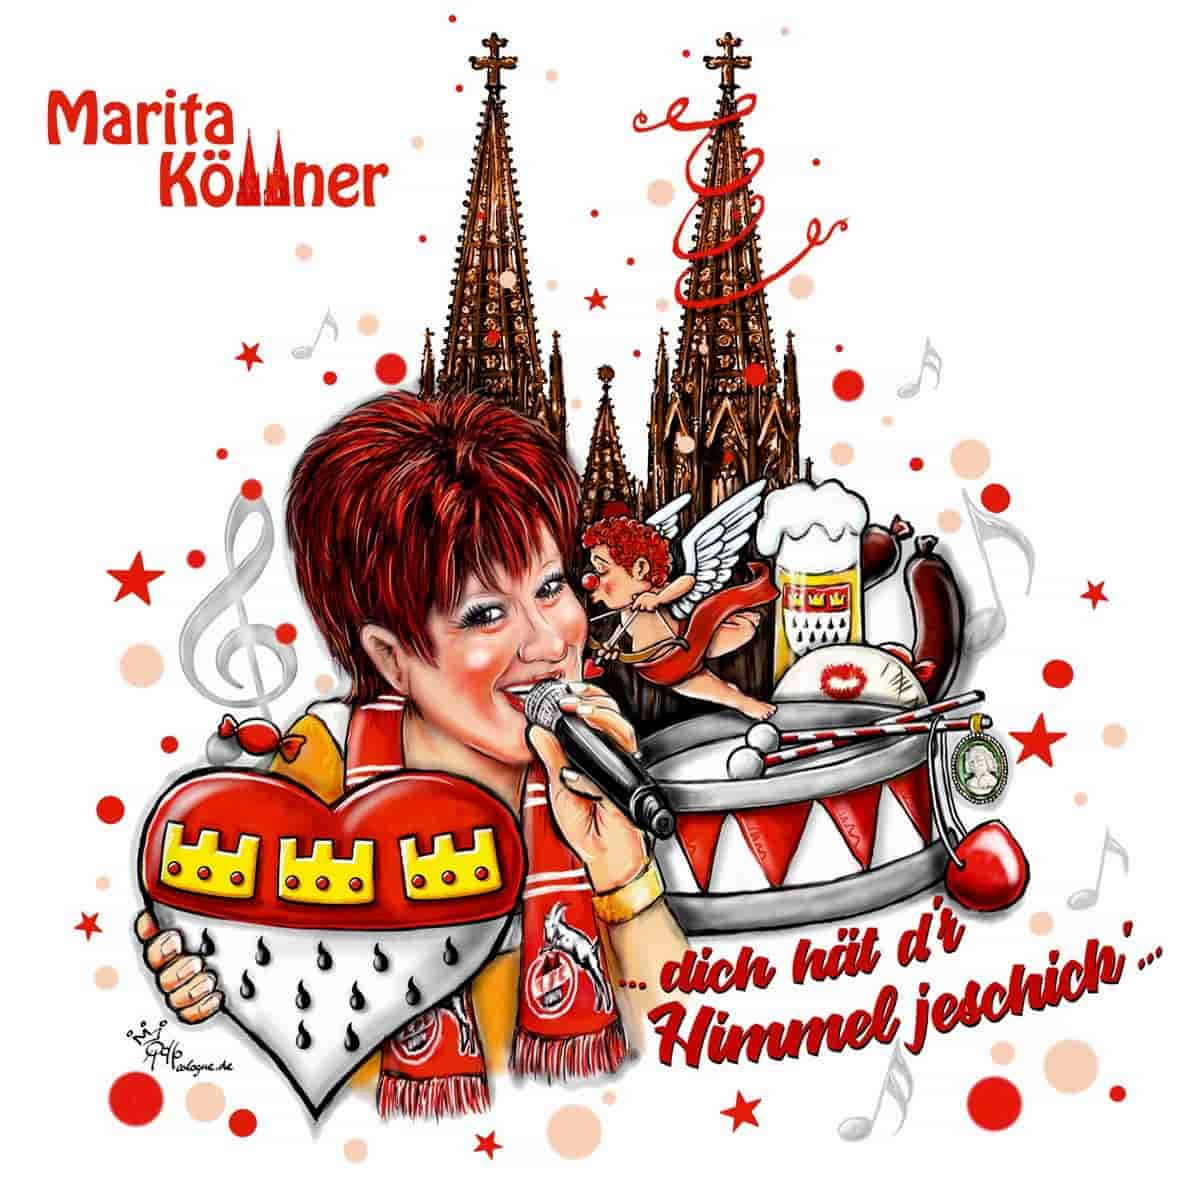 Marita Köllner - CD Dich hät dr Himmel jeschick 2019